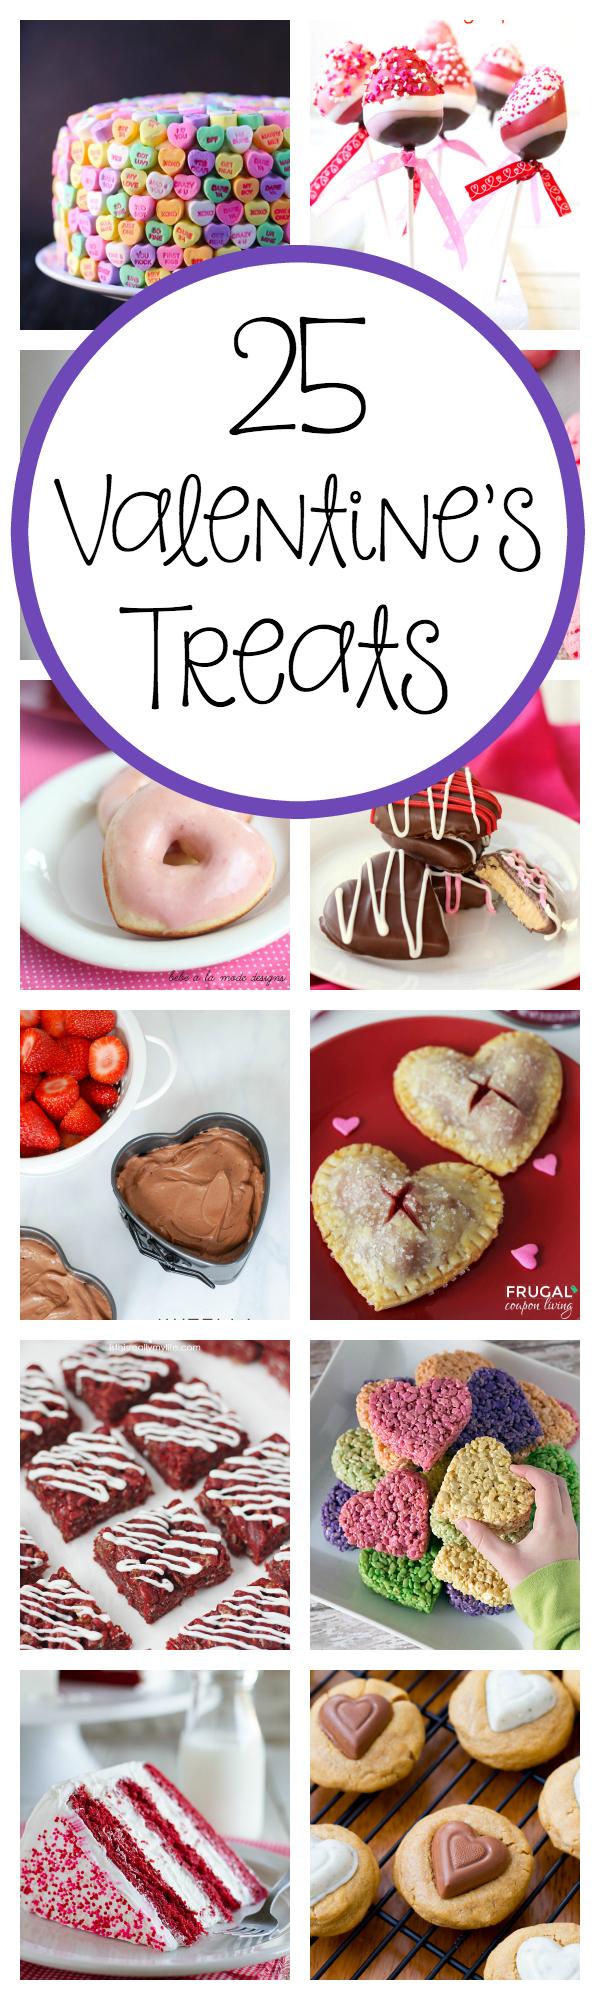 25 Amazing Treat Ideas for Valentine's Day